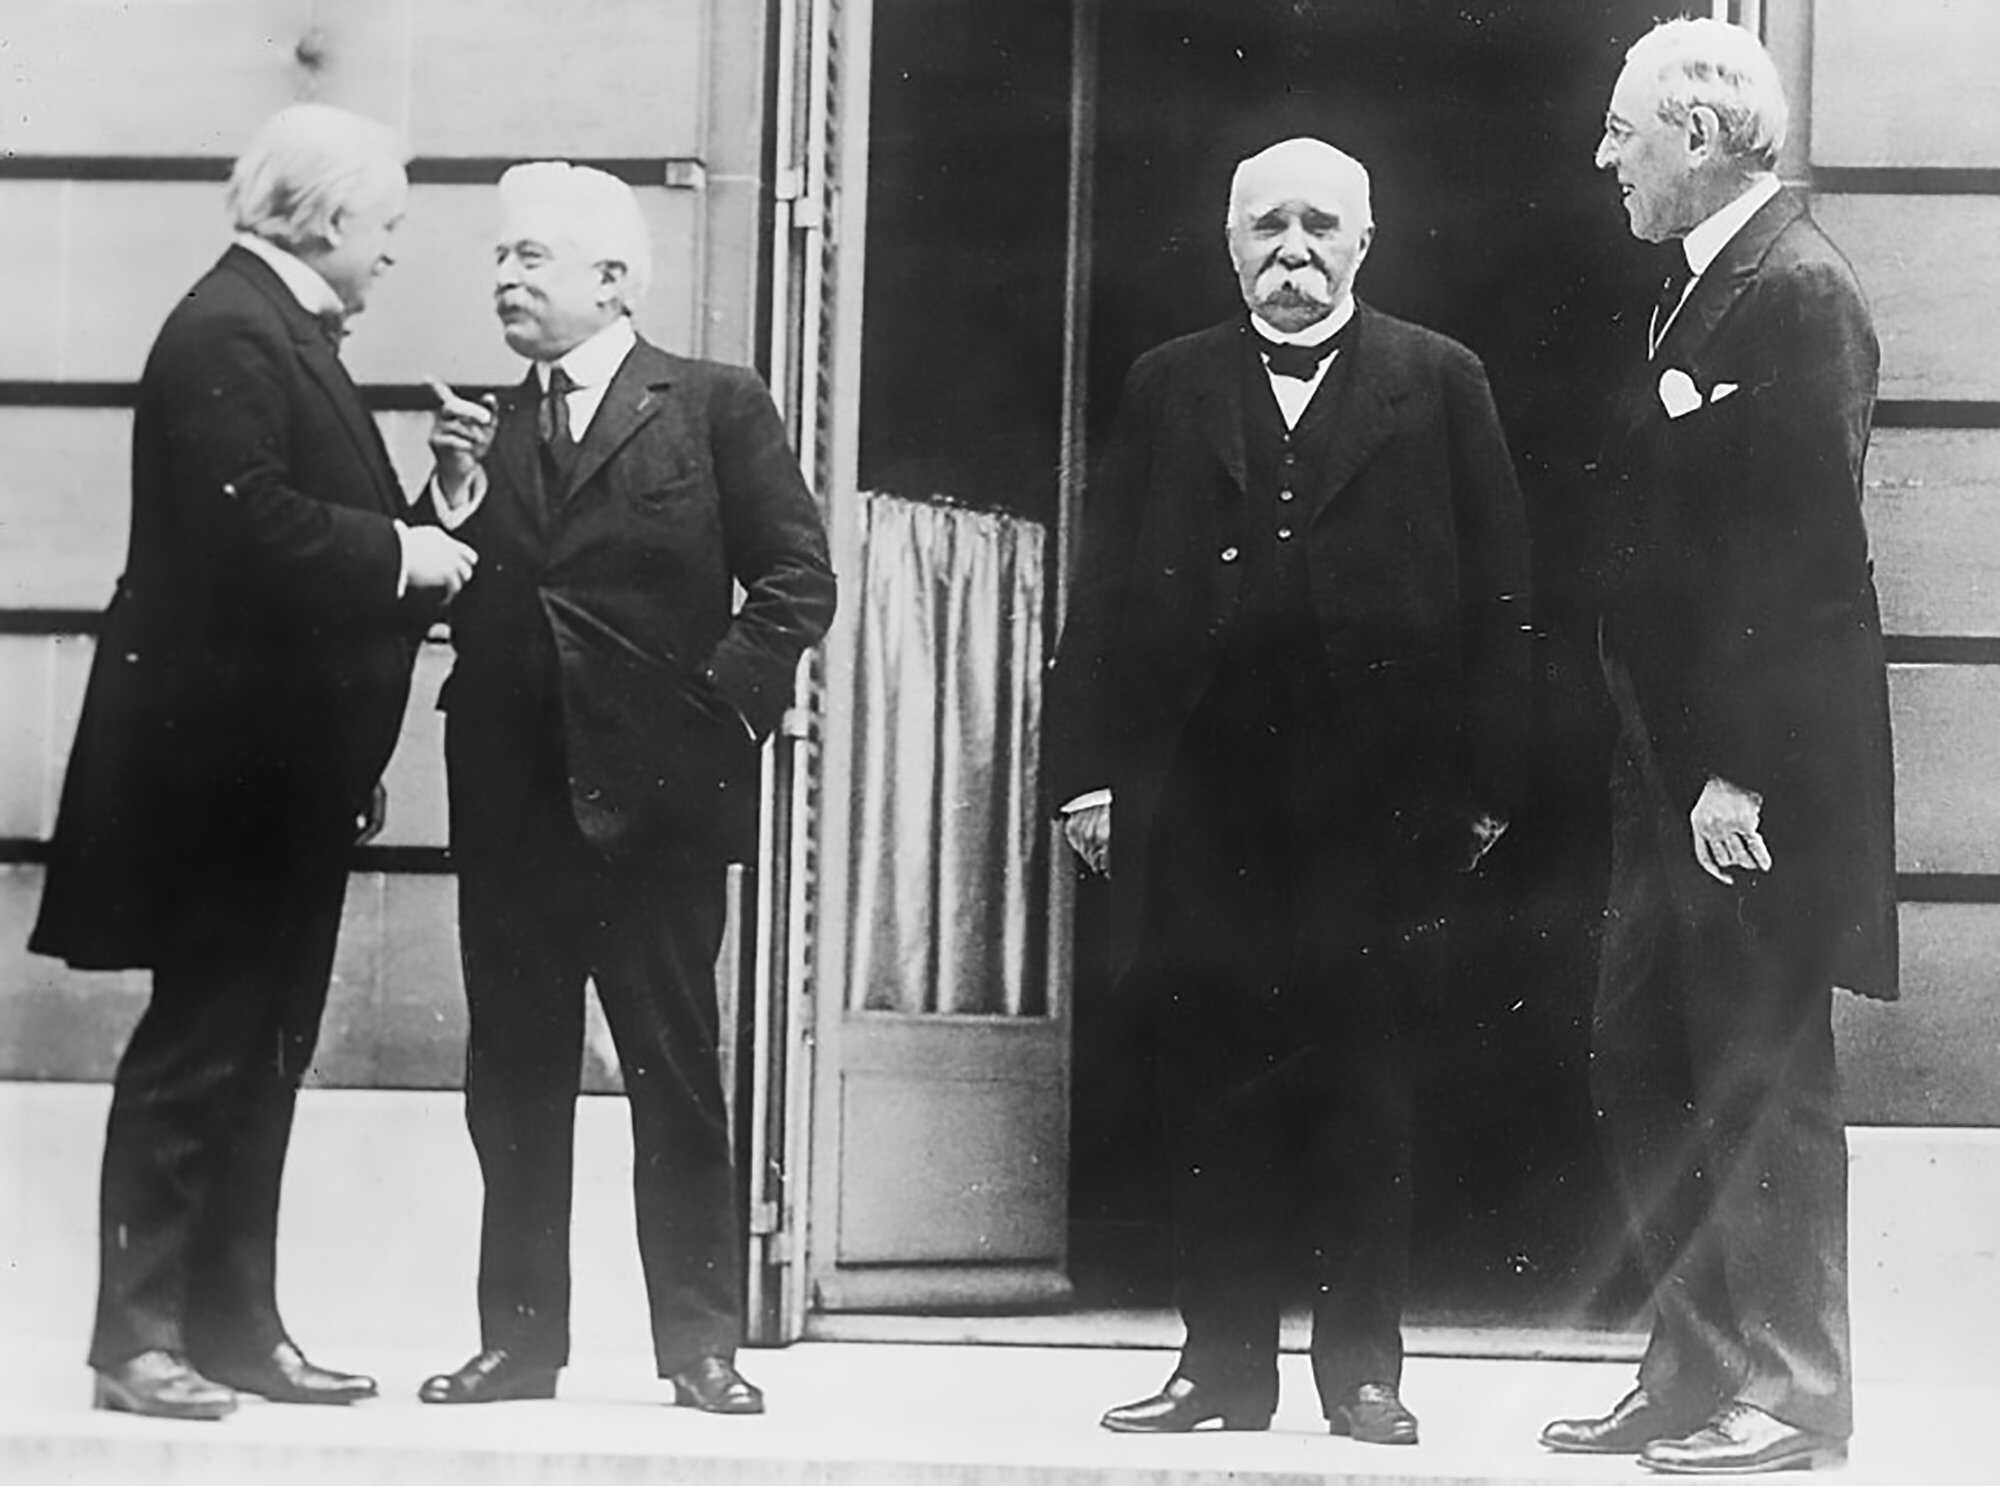 Wilson-League-of-Nations-1915-LOC.jpg